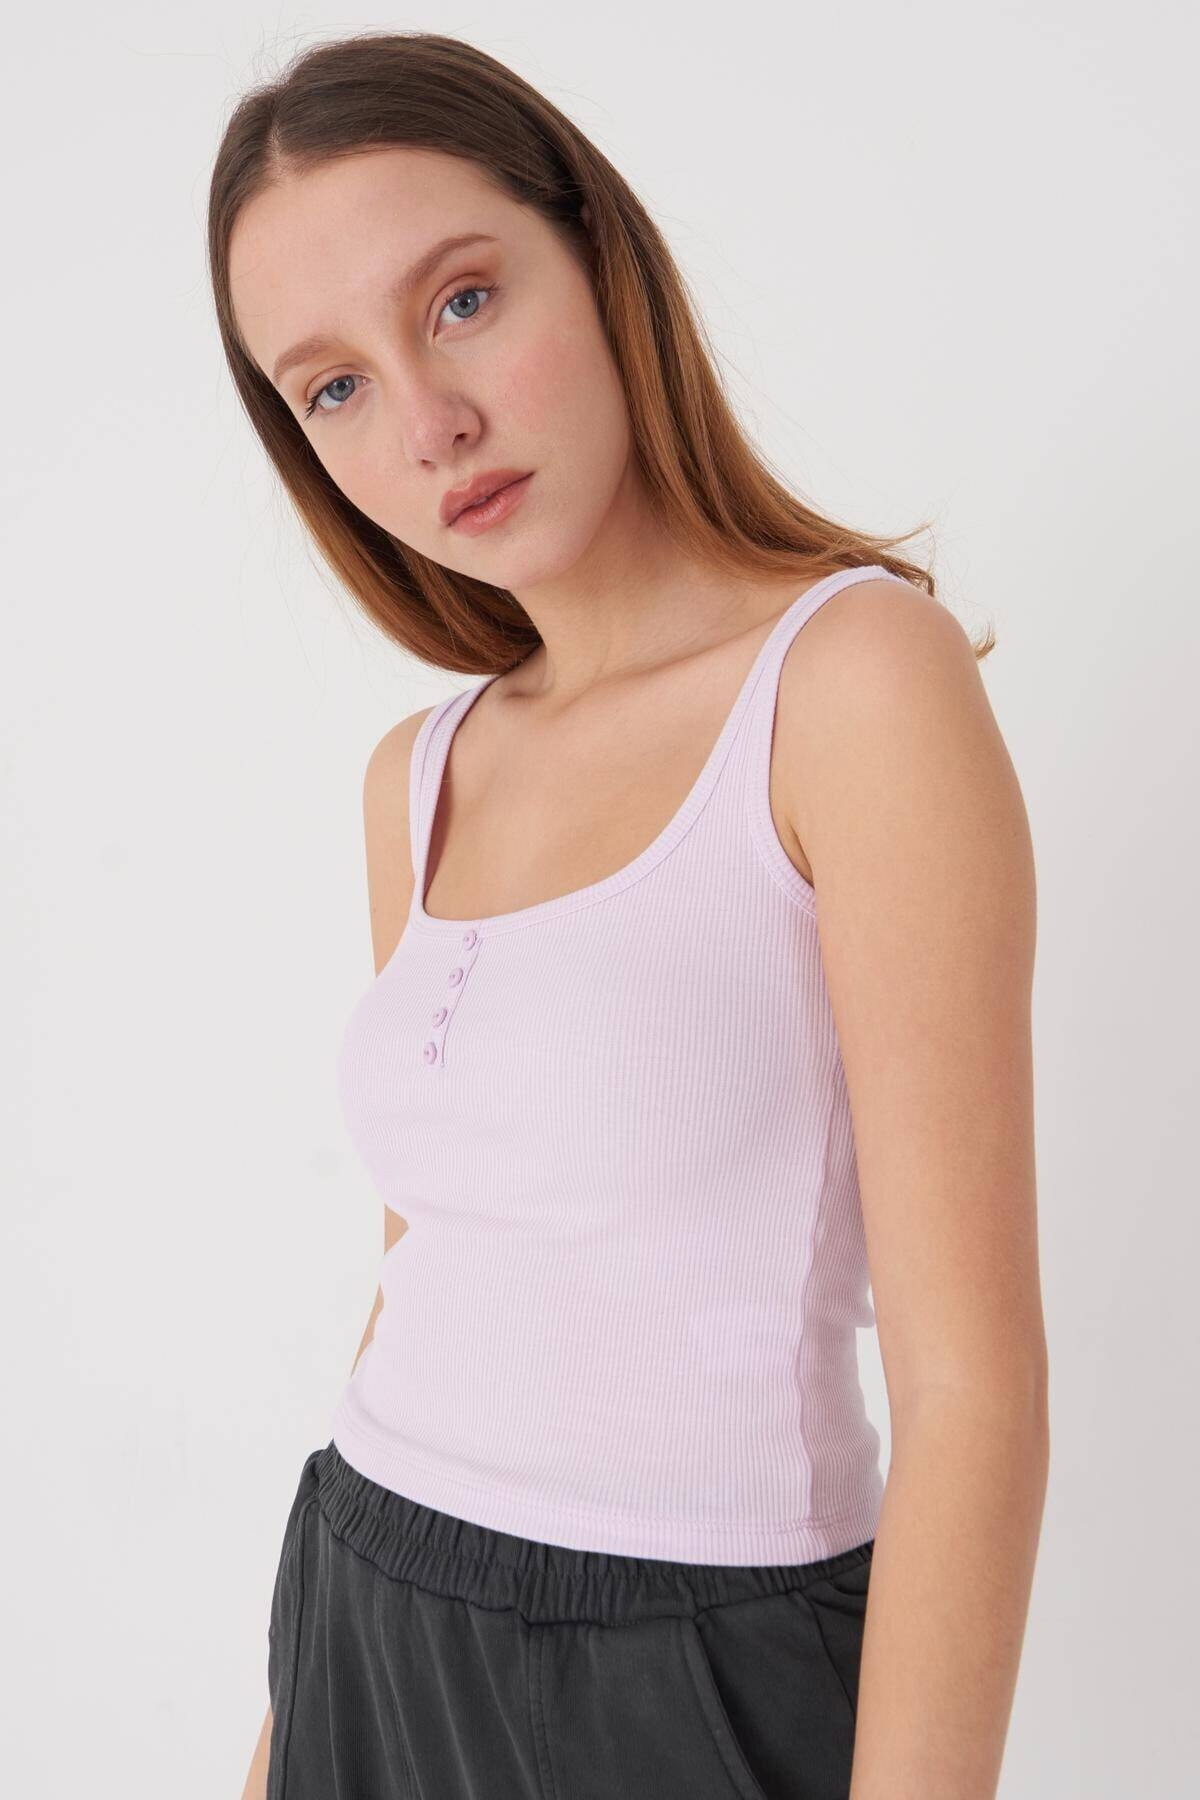 Addax Kadın Açık Lila Askılı Bluz A0963 - Dk11 Adx-0000022397 0